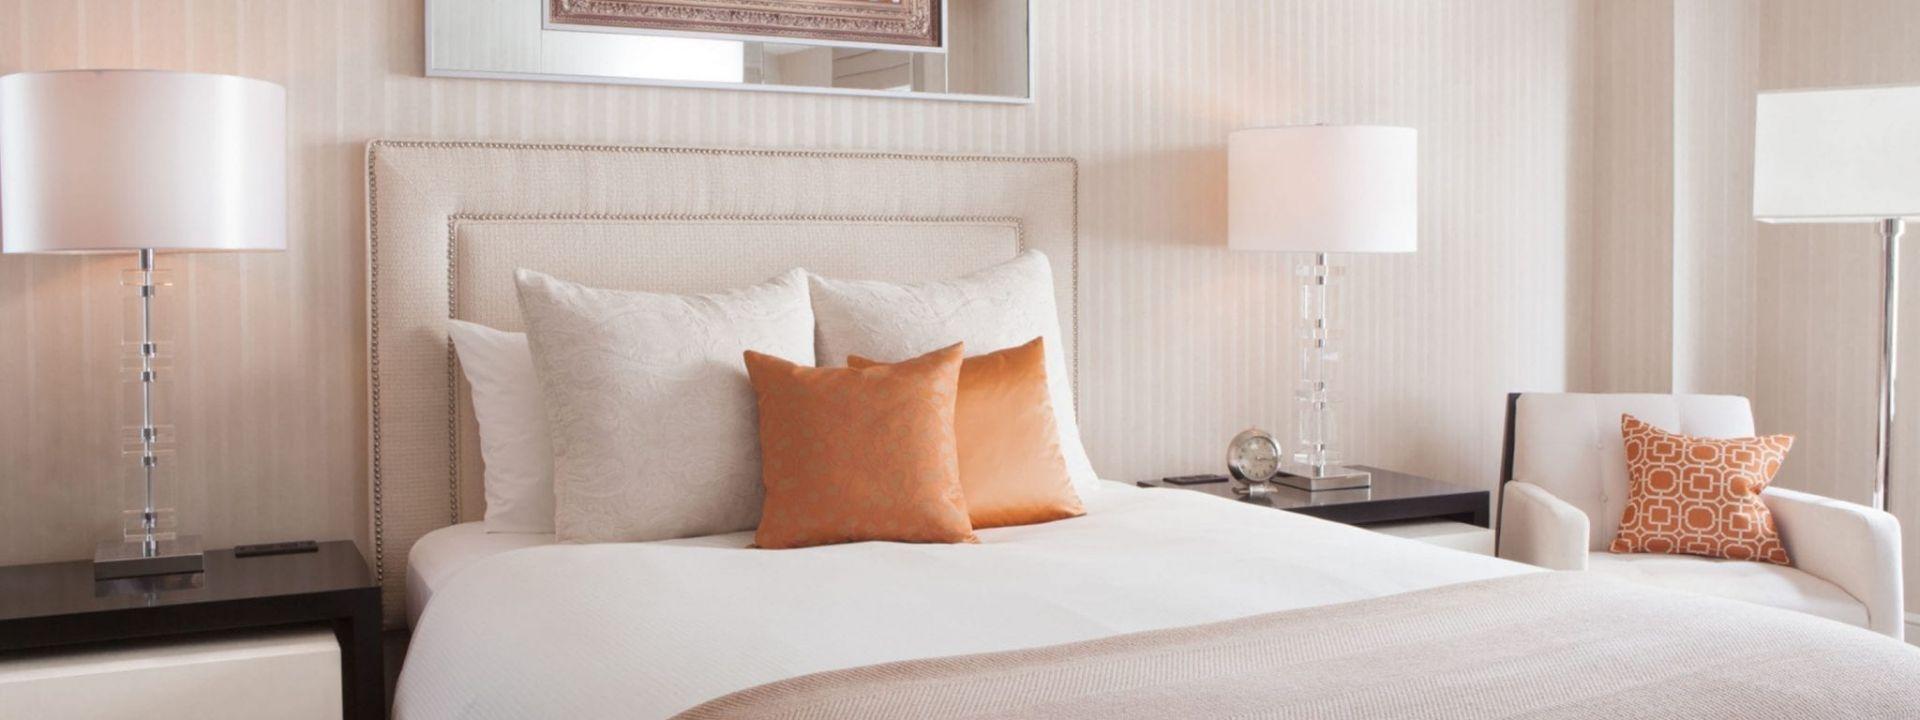 A Guestroom Bed at The Benjamin NYC